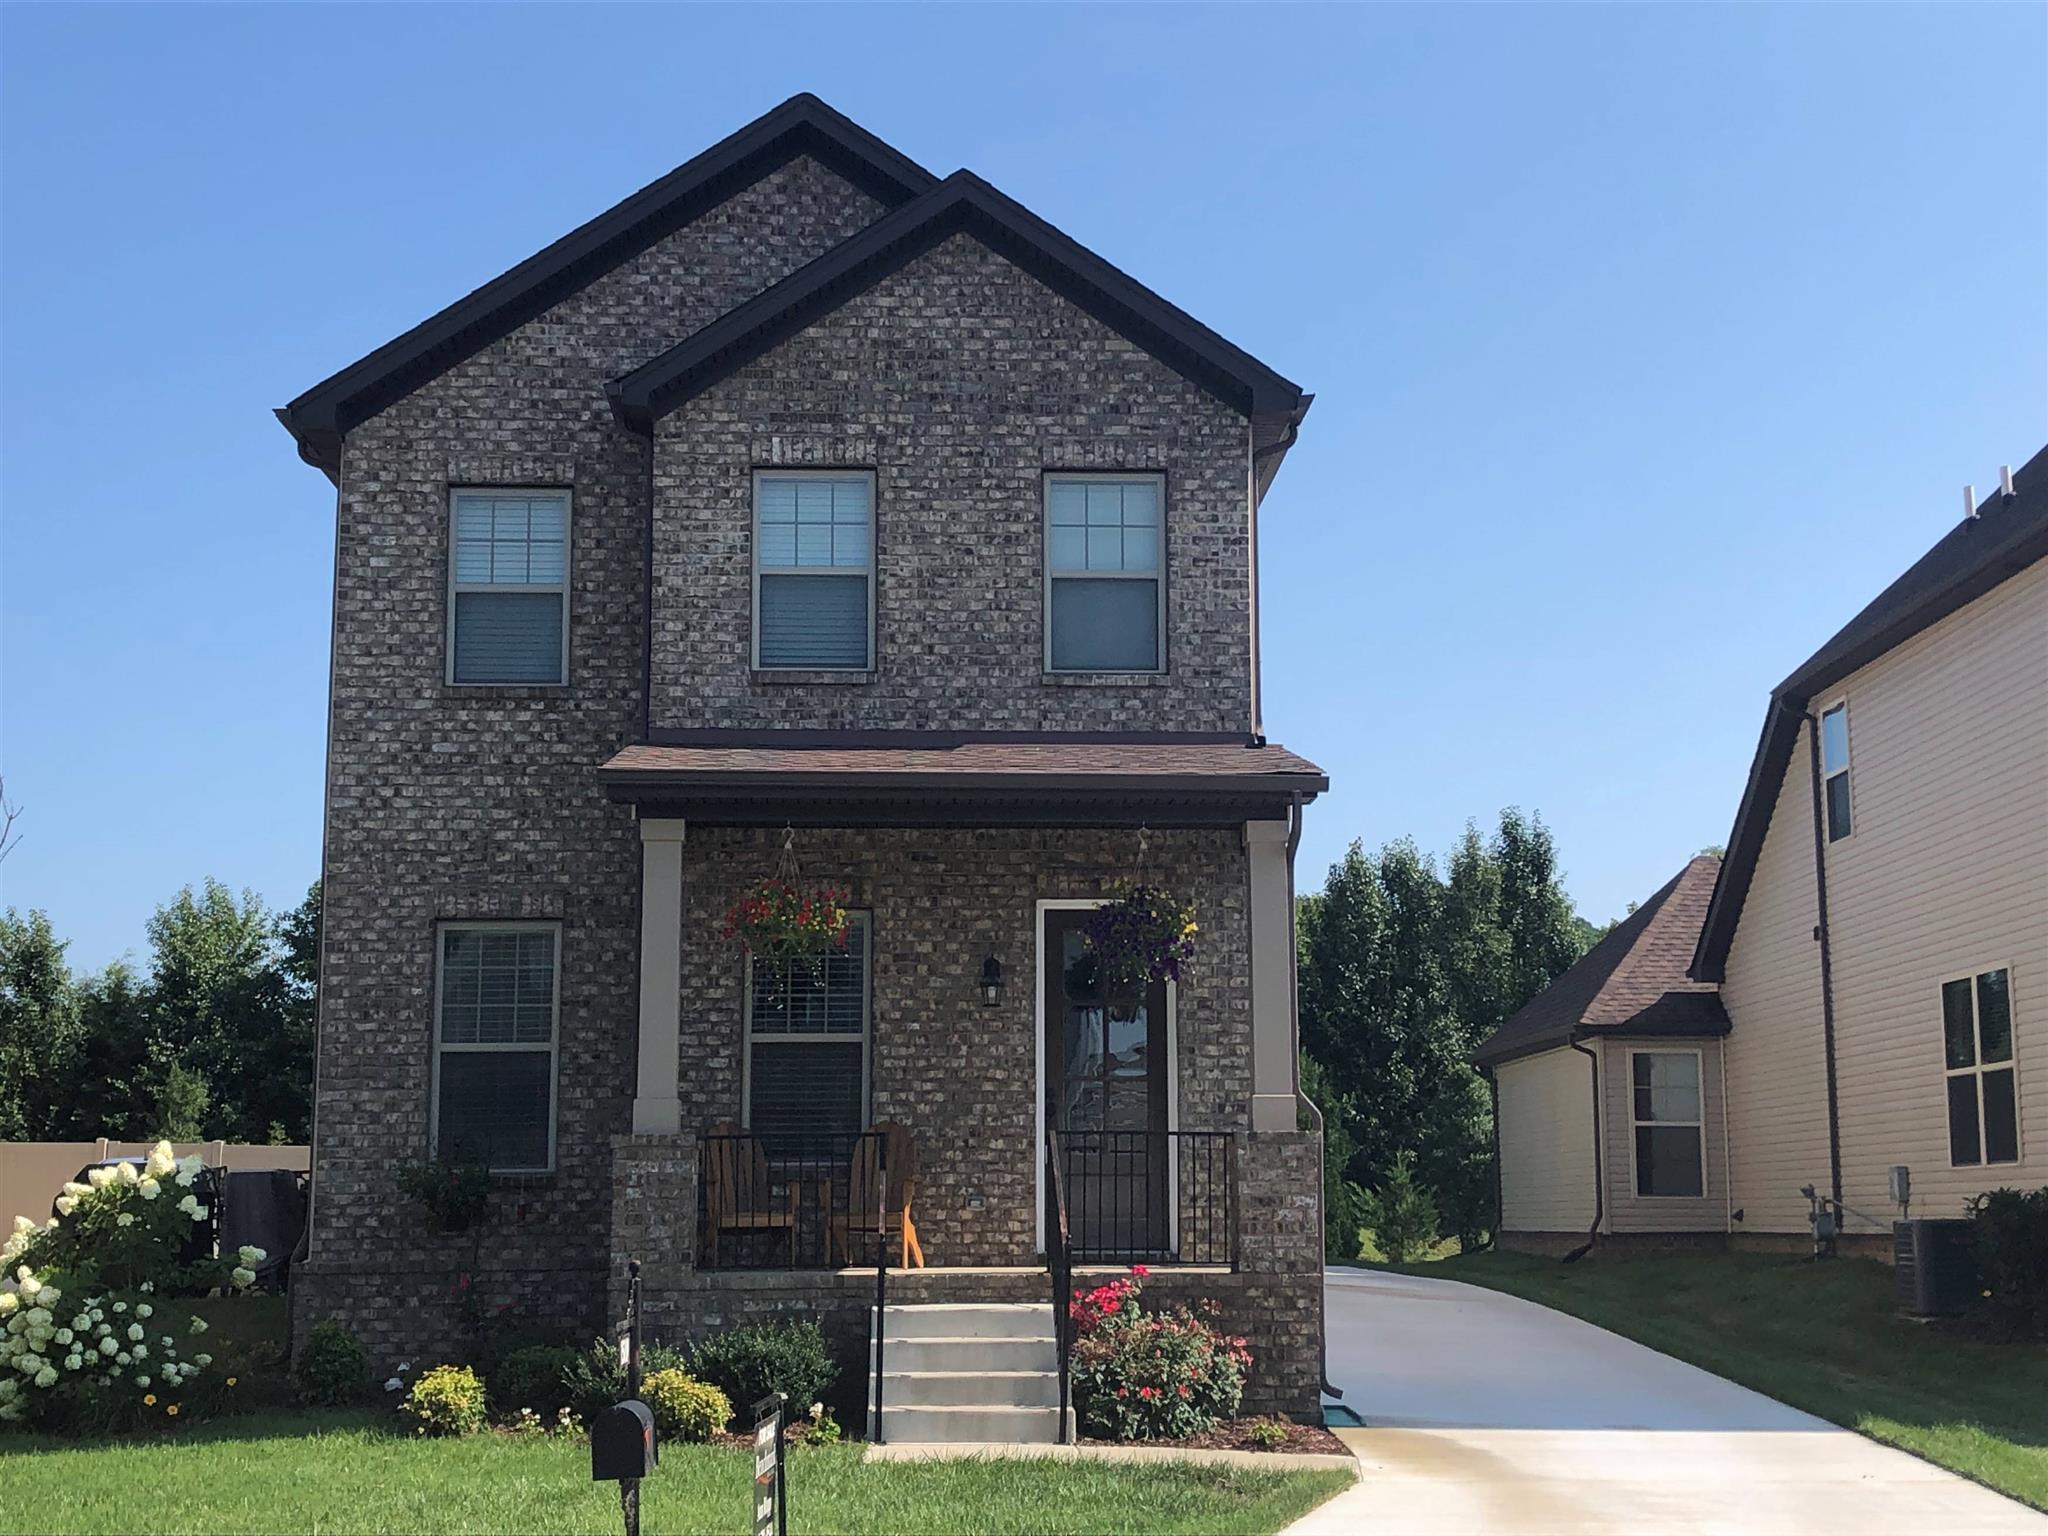 1589 Brockton Ln, Nashville, TN 37221 - Nashville, TN real estate listing